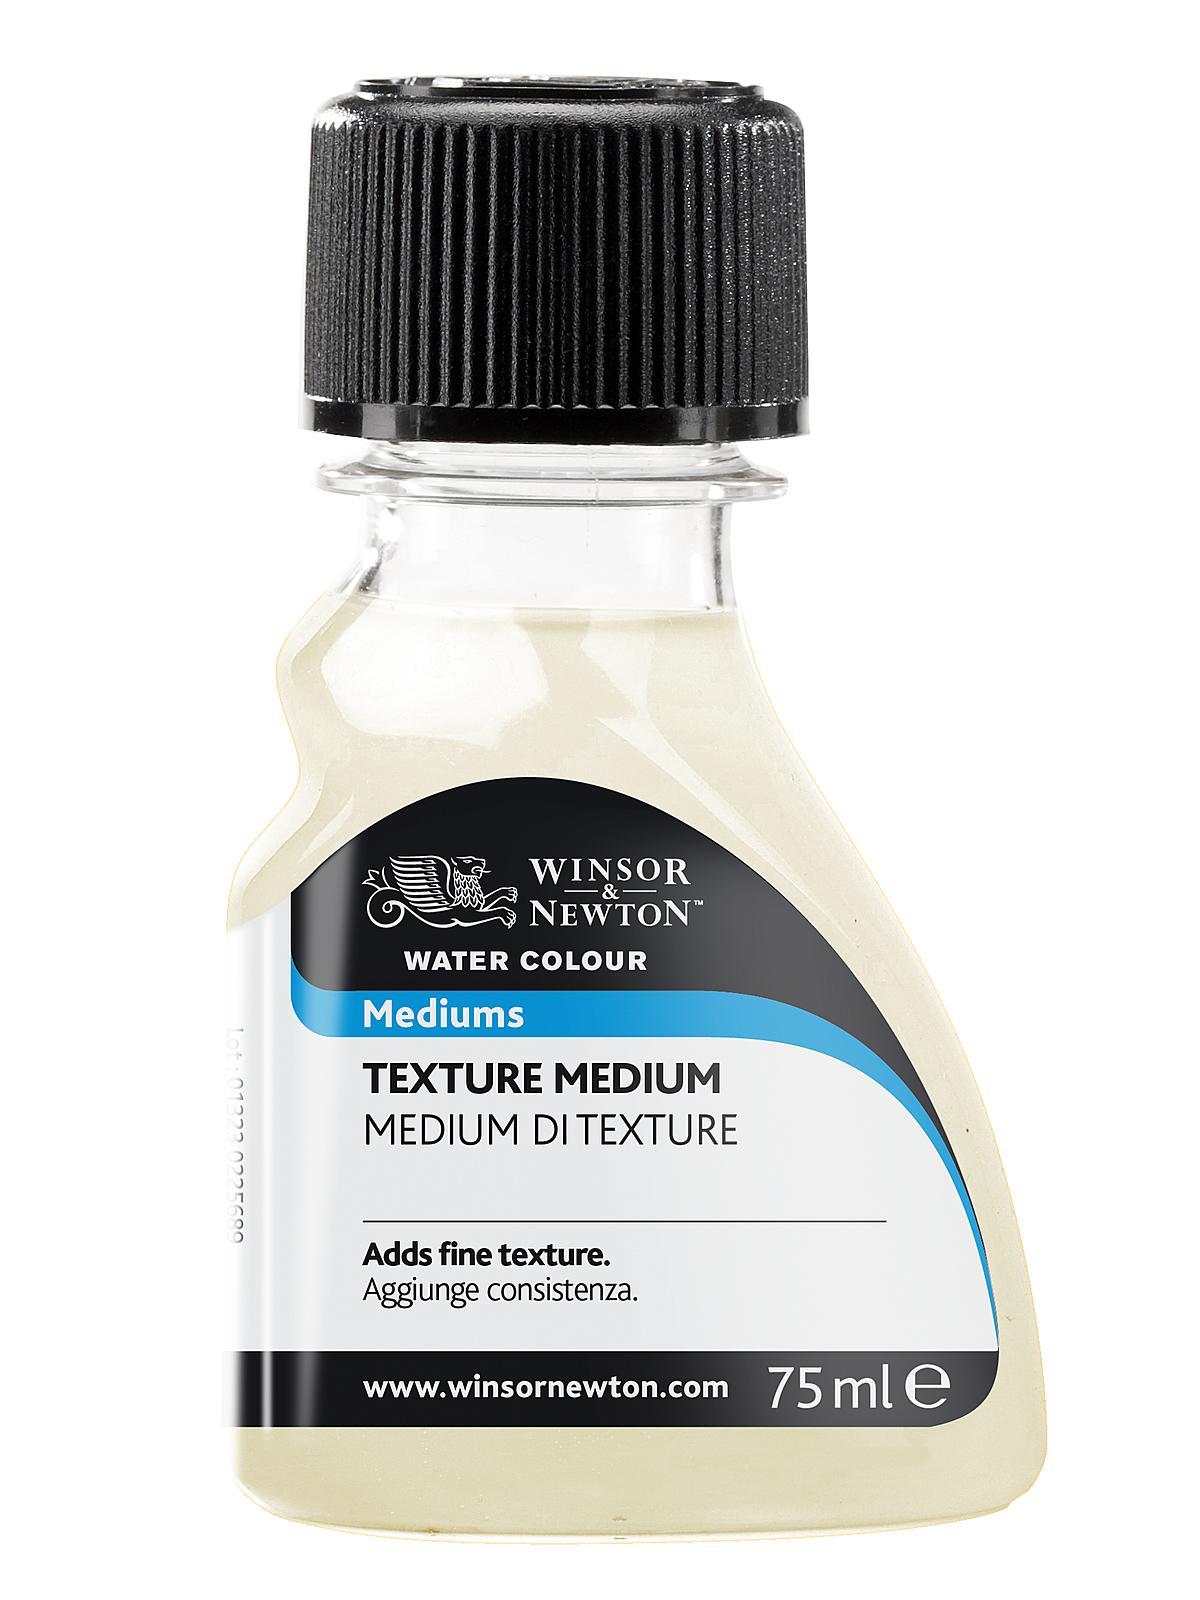 Winsor & Newton - Water Colour Texture Medium